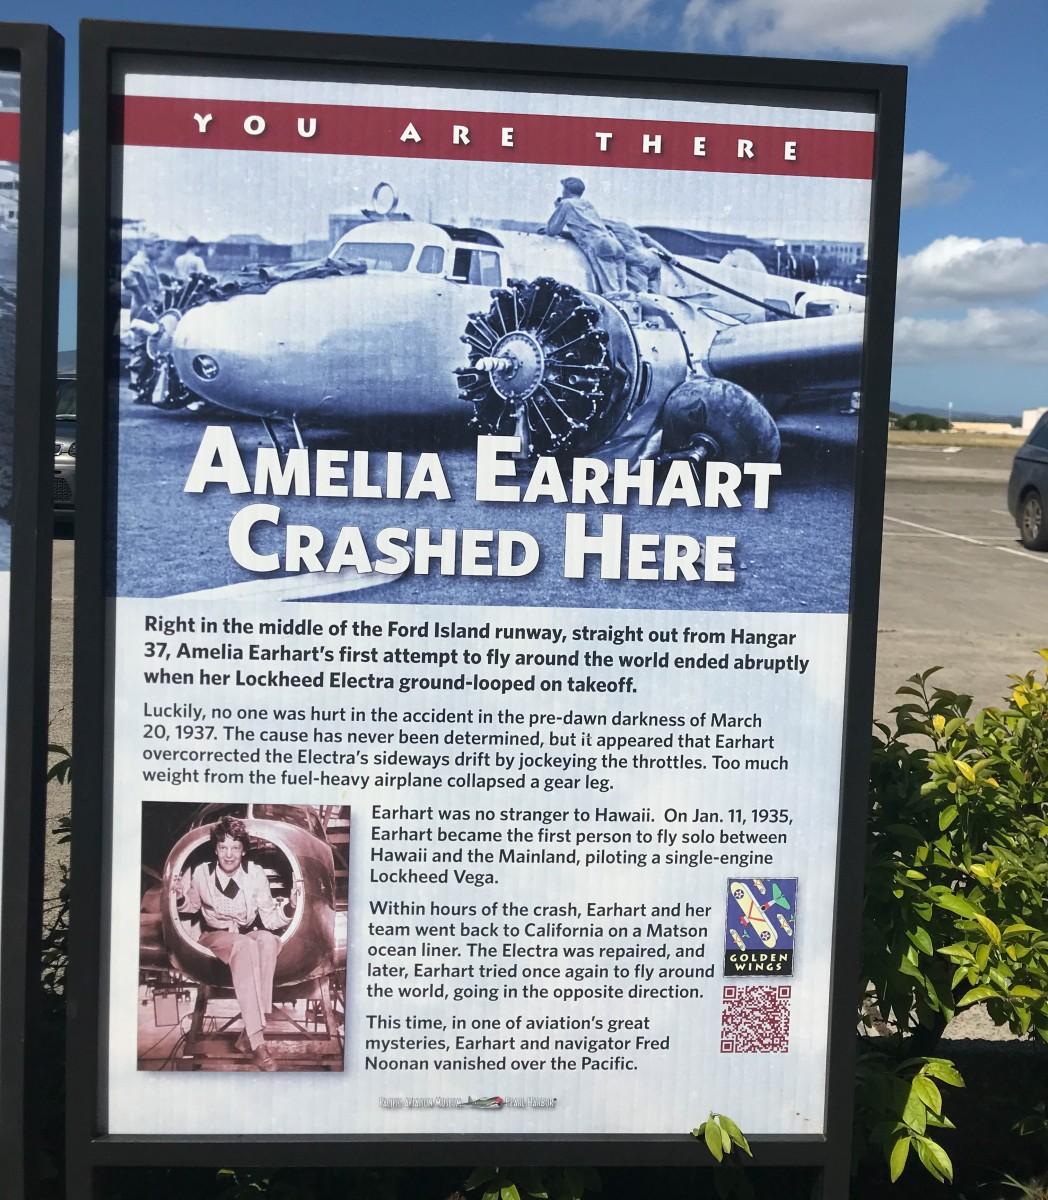 Amelia Earhart Crashed Here On Ford Island